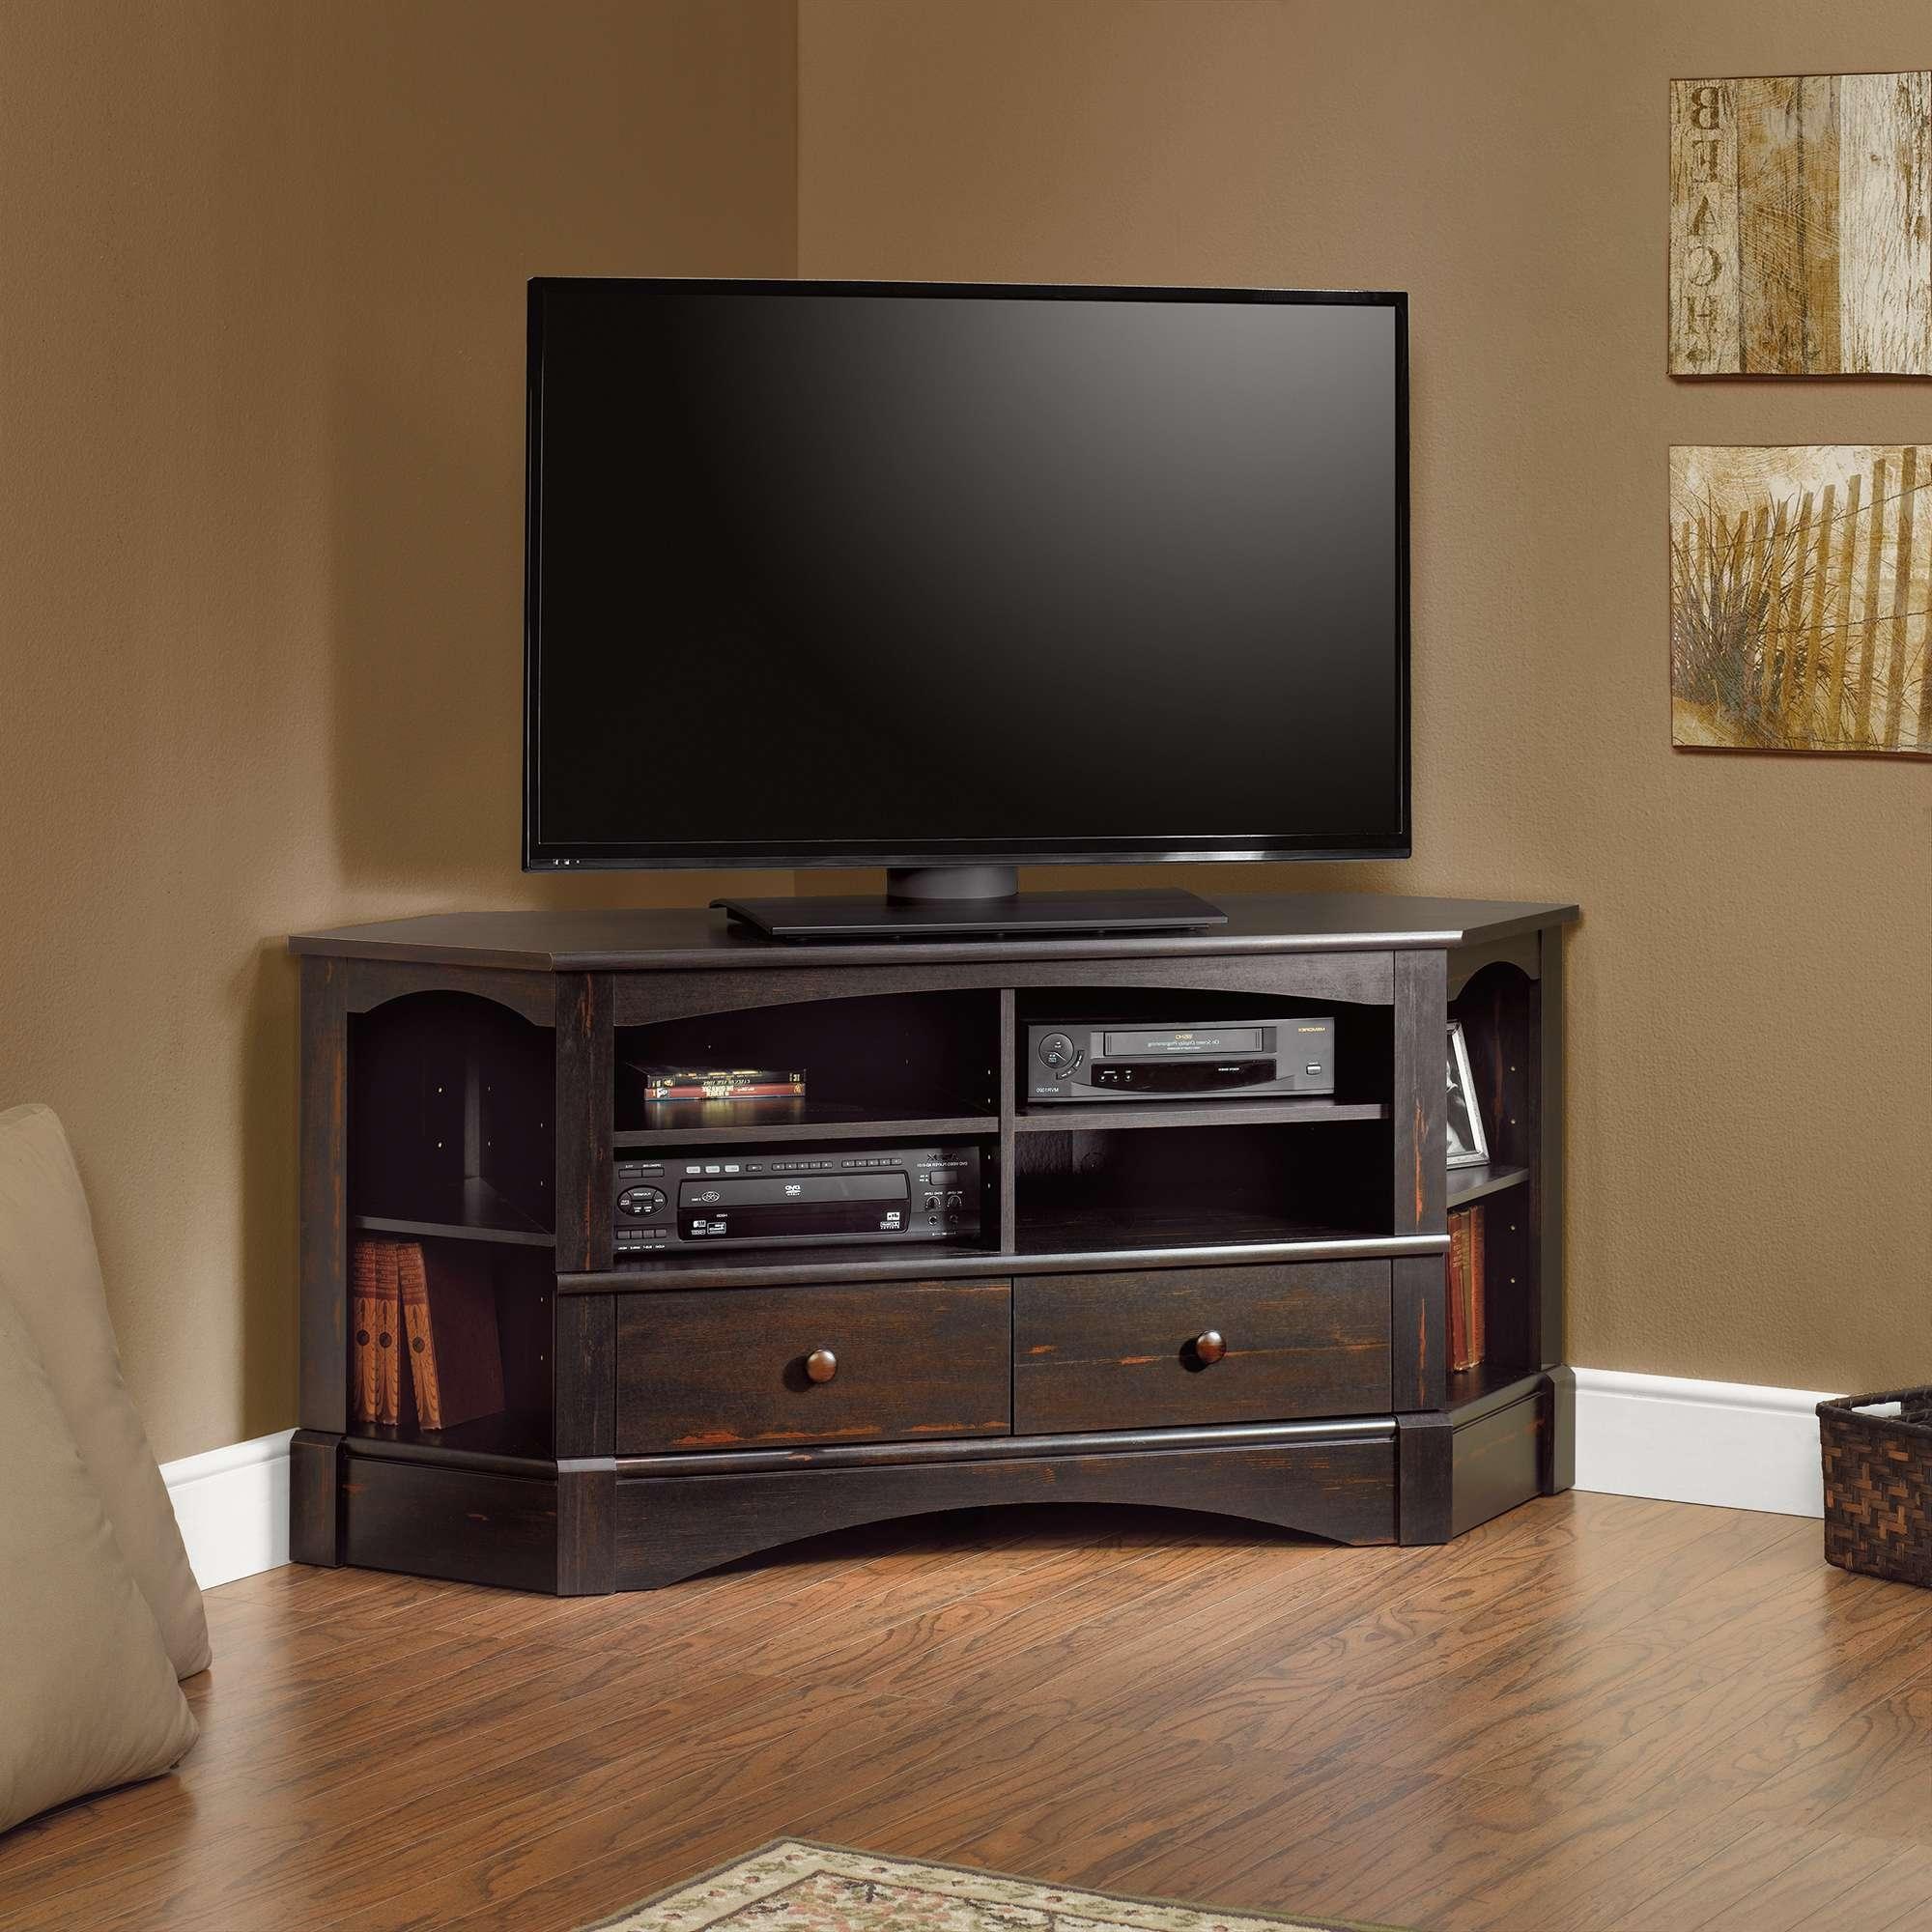 Harbor View | Corner Entertainment Credenza | 402902 | Sauder Within Corner Tv Stands (View 3 of 15)